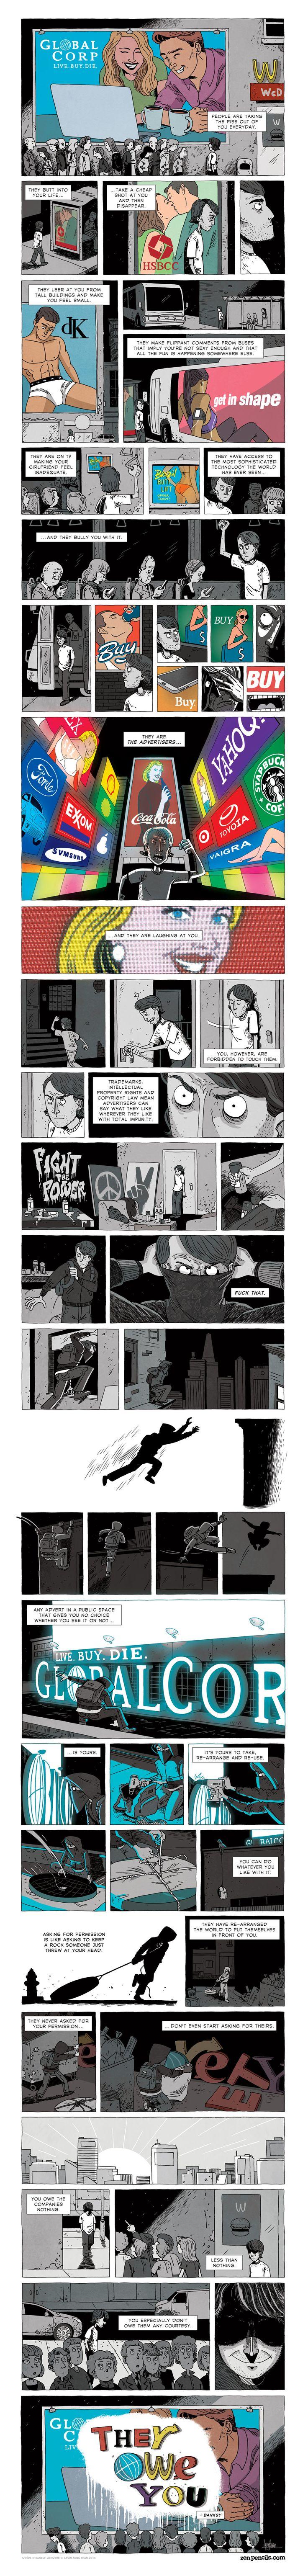 Anti-Corporate Banksy Inspired Comic Art - http://dashburst.com/anti-corporate-banksy-inspired-comic-art/